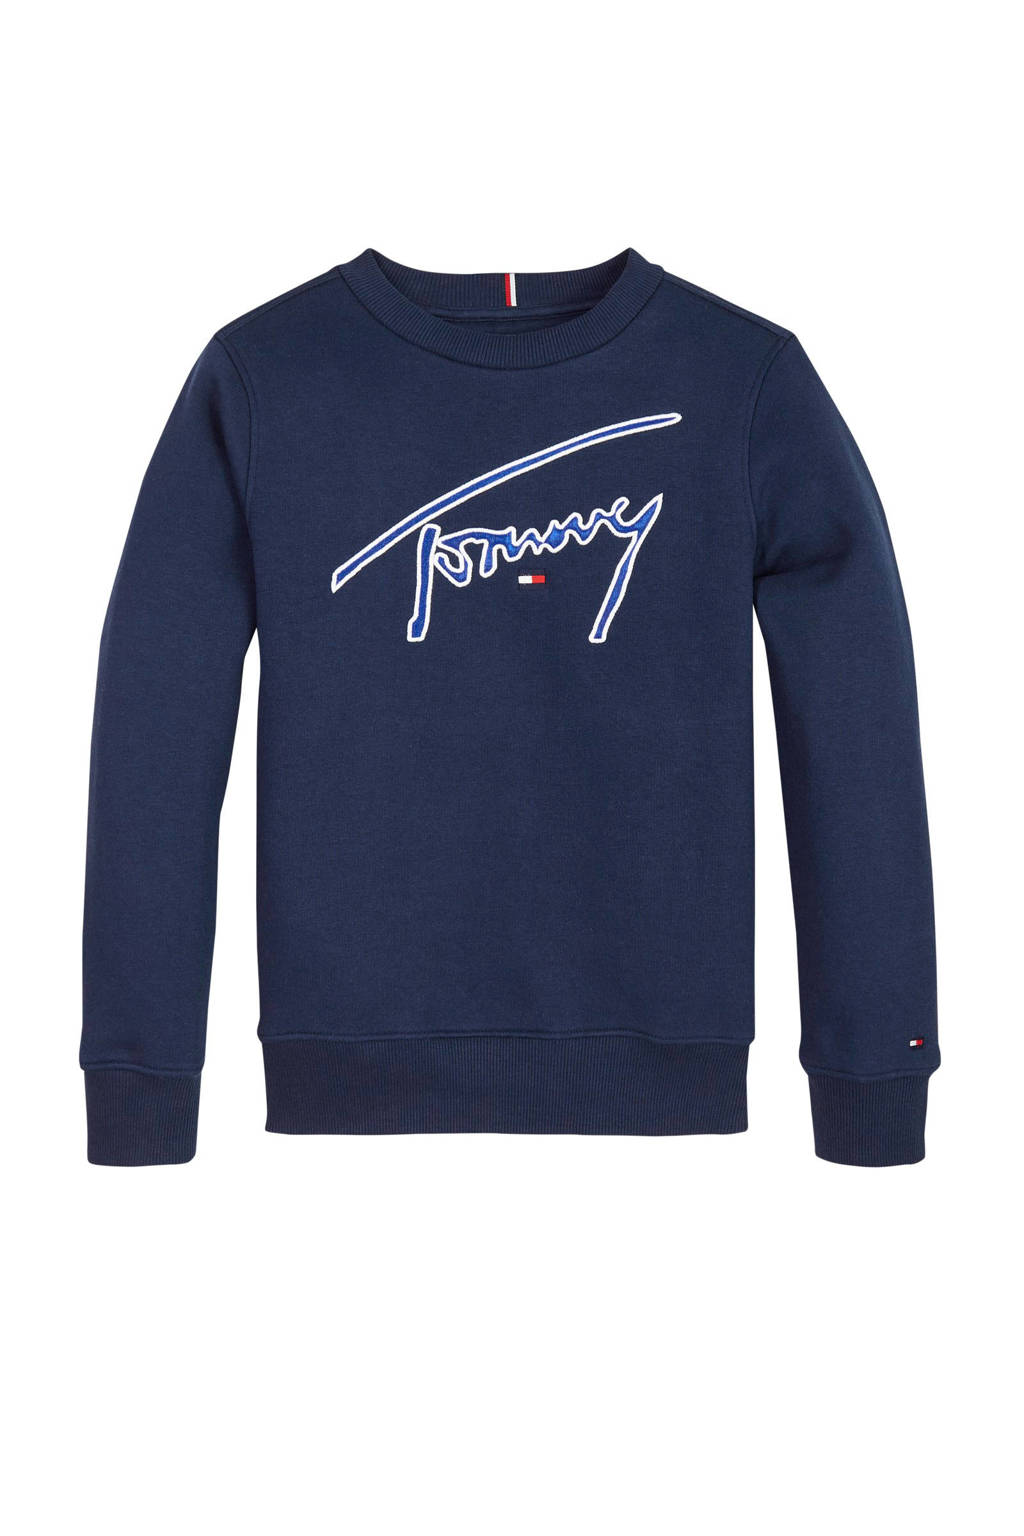 Tommy Hilfiger sweater met logo en borduursels donkerblauw, Donkerblauw